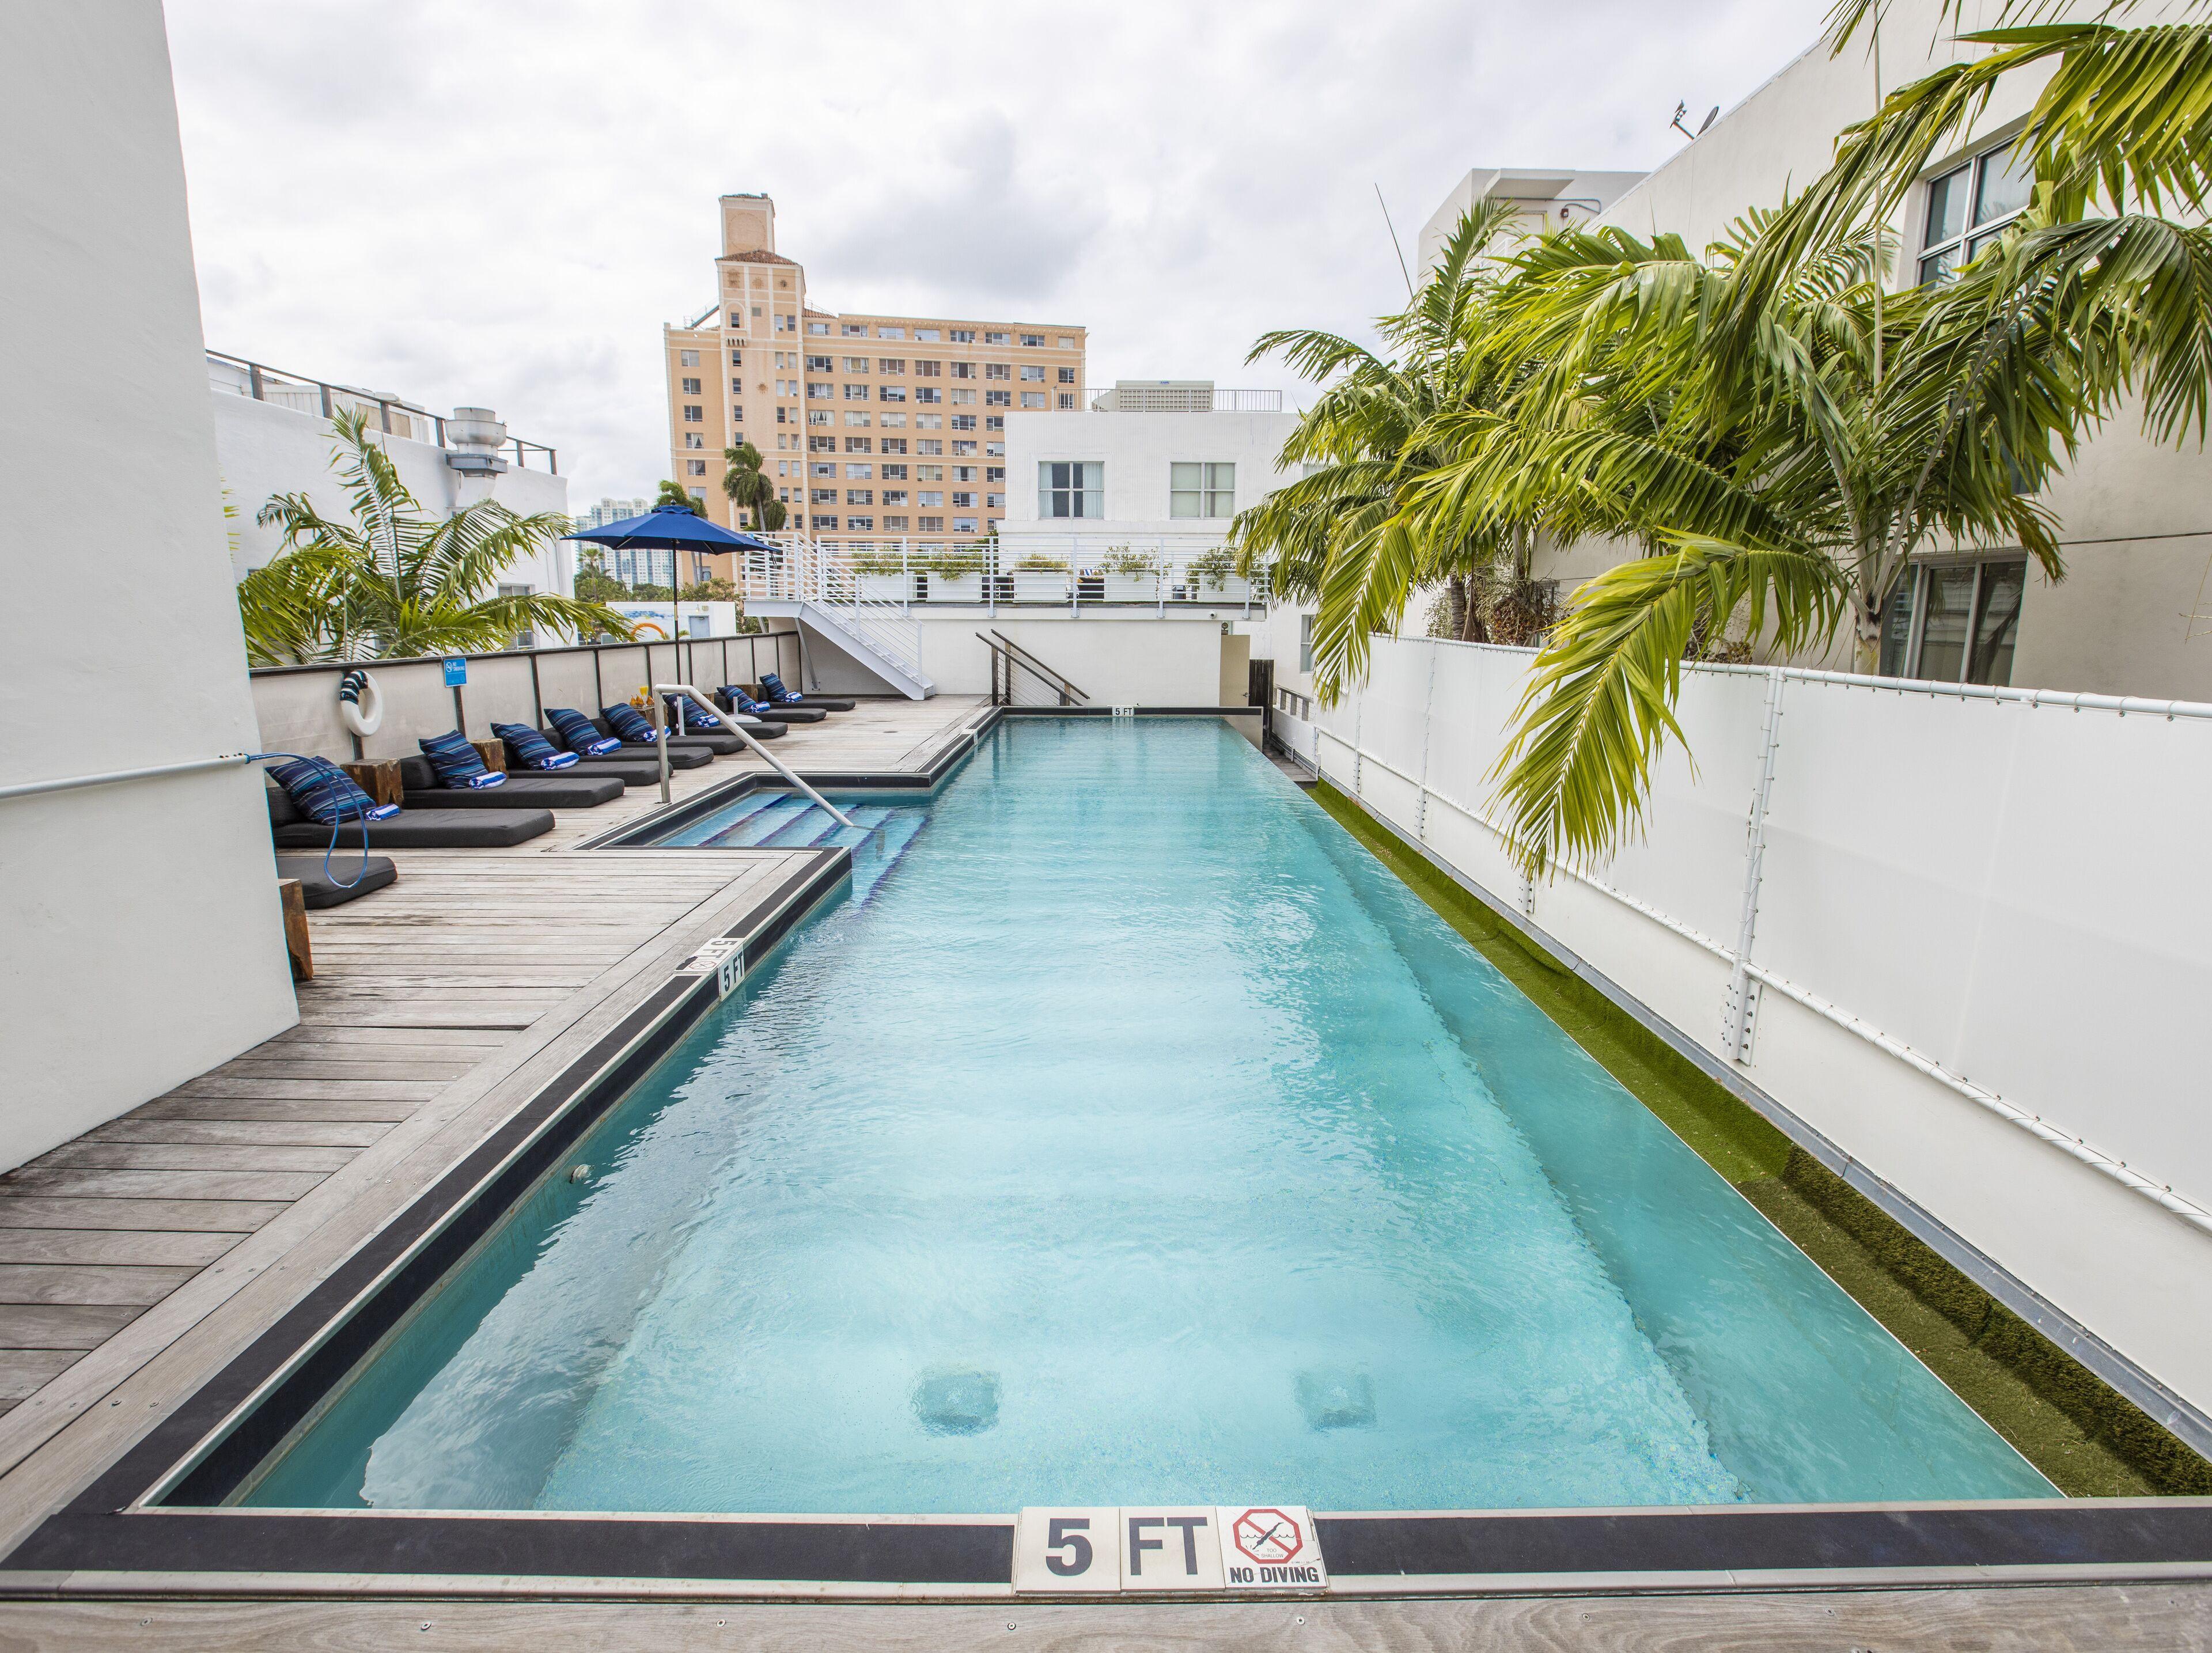 Courtesy of Posh South Beach Hostel / Expedia